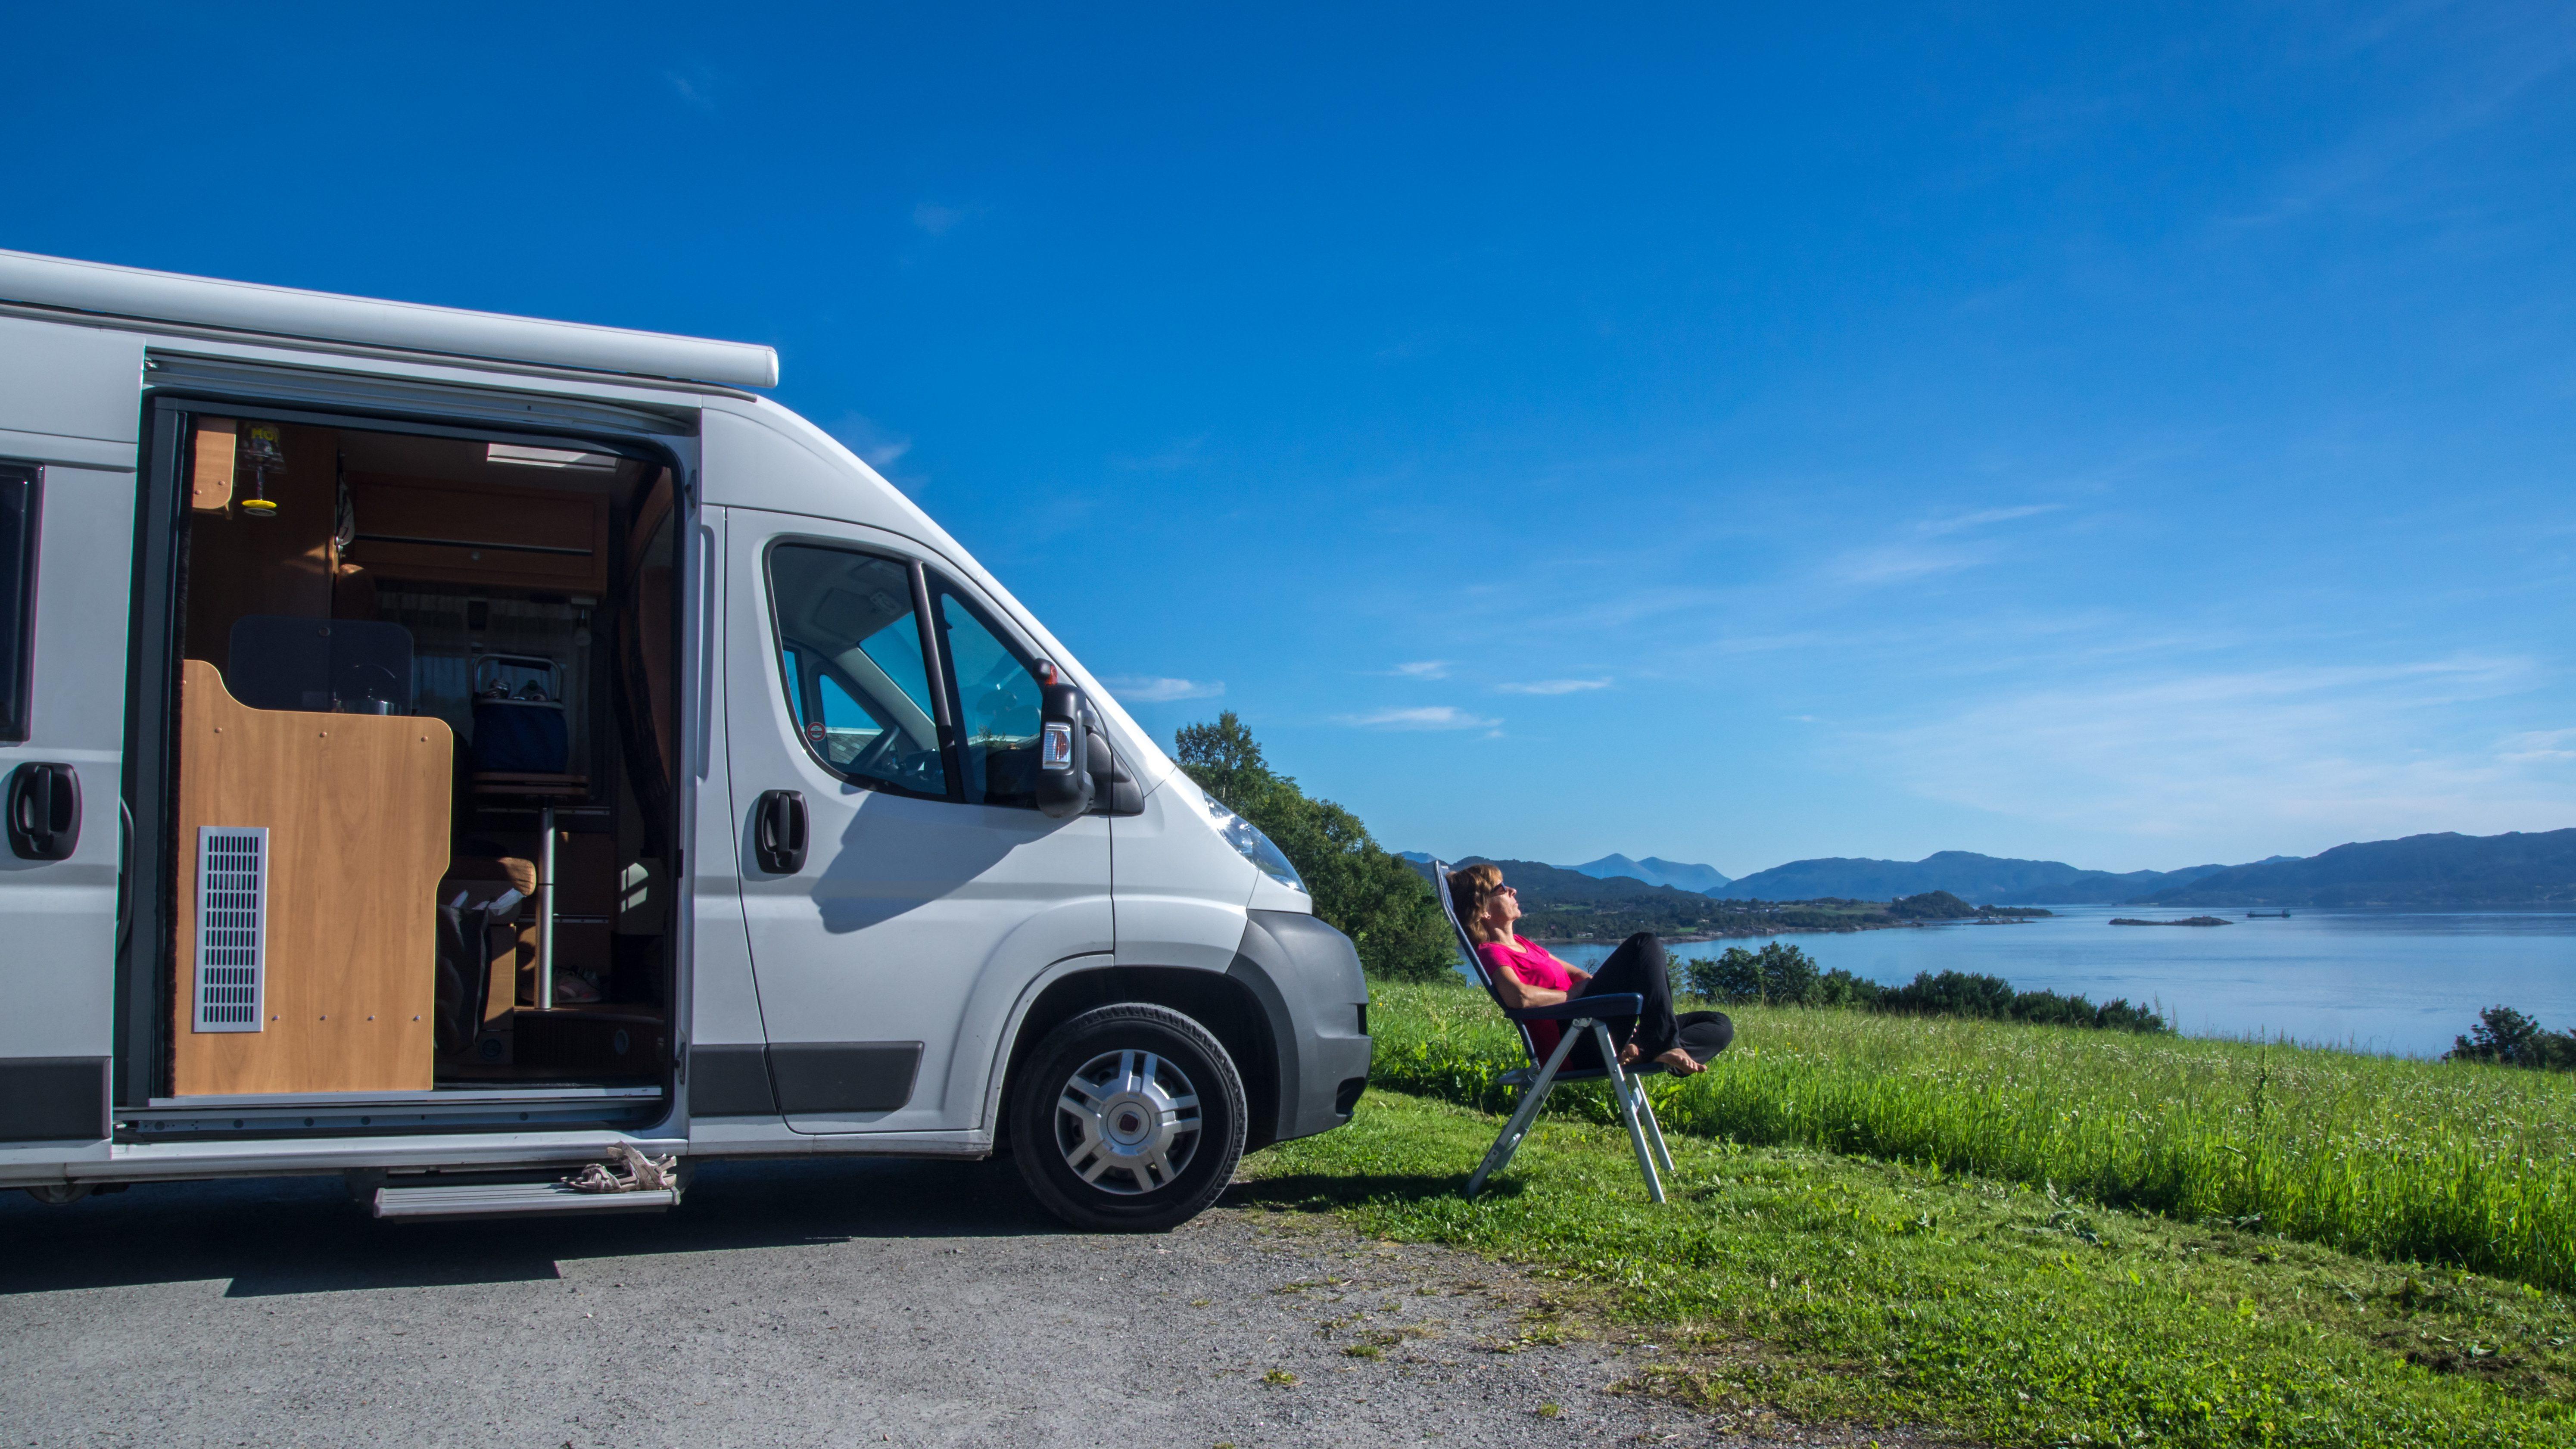 We Bought a New RV, Here's Why We'd Do It Again